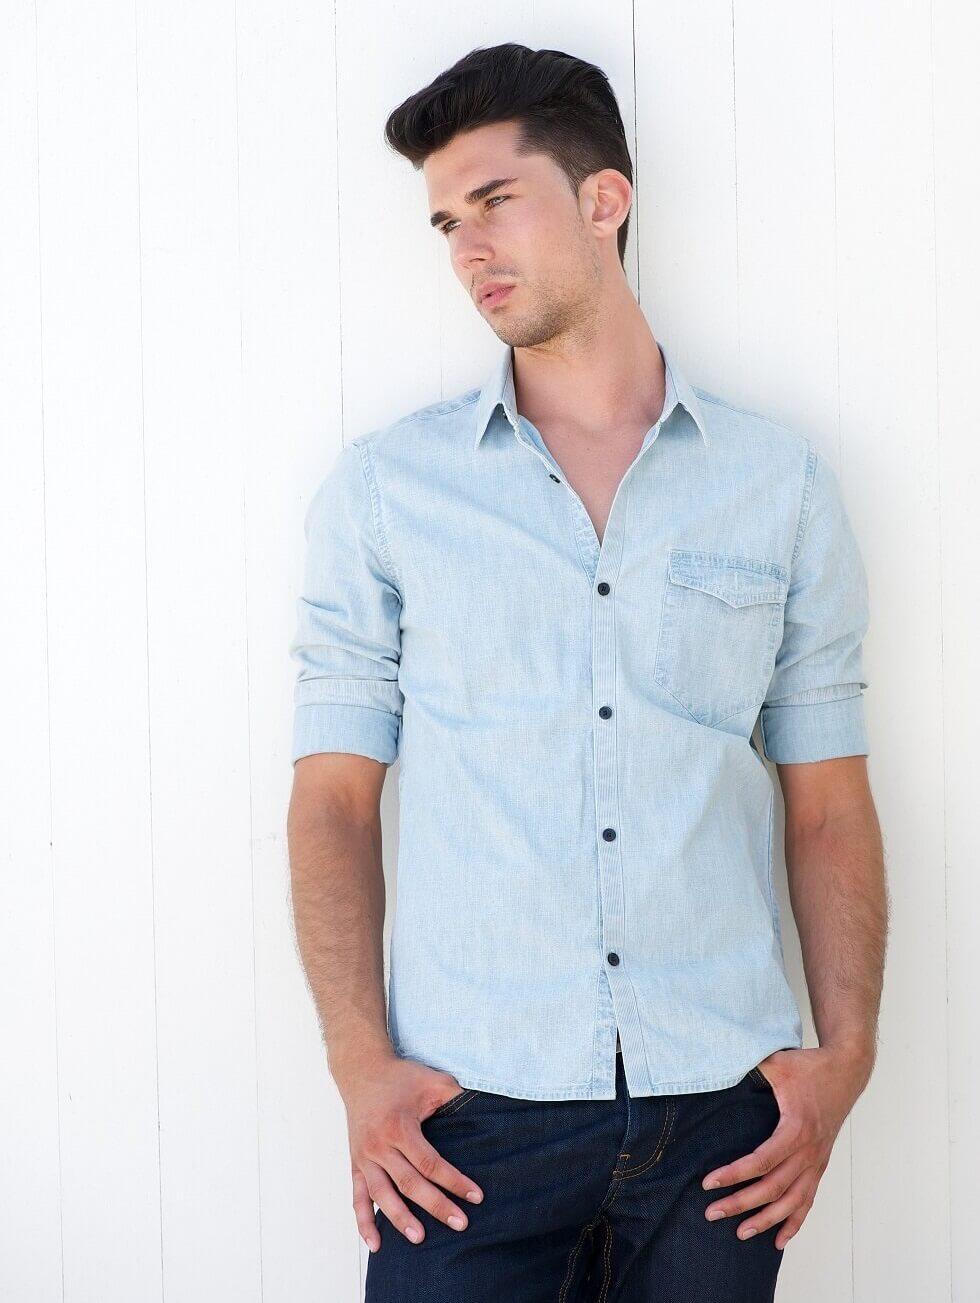 Blue Men Shirt Image 01